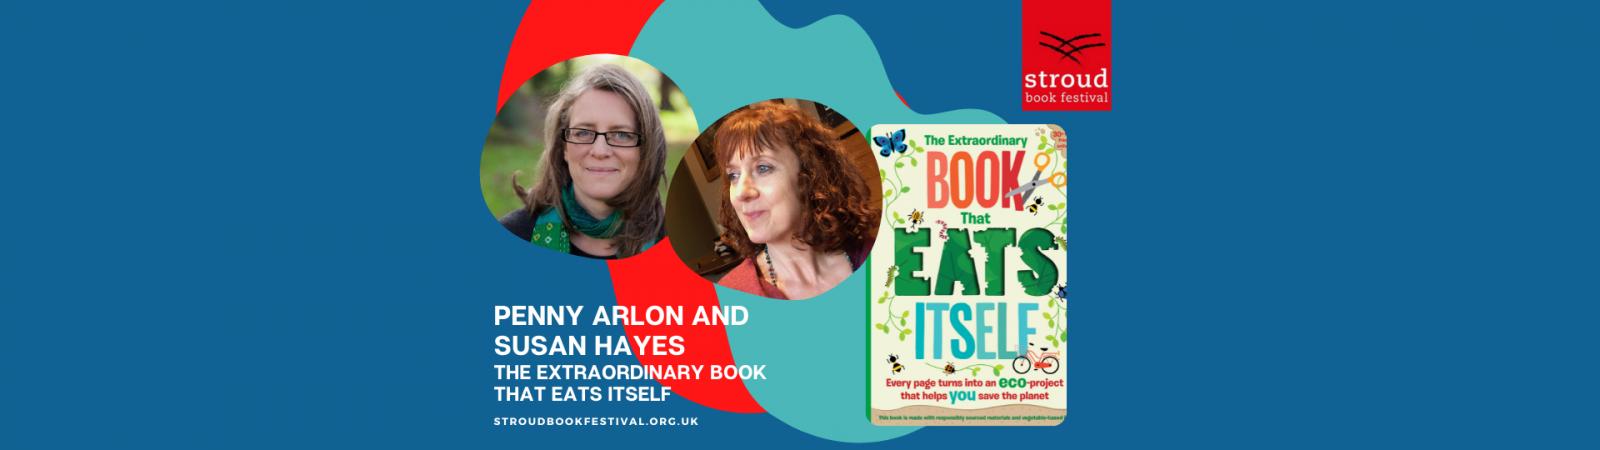 Penny Arlon & Susan Hayes, The Extraordinary Book That Eats Itself